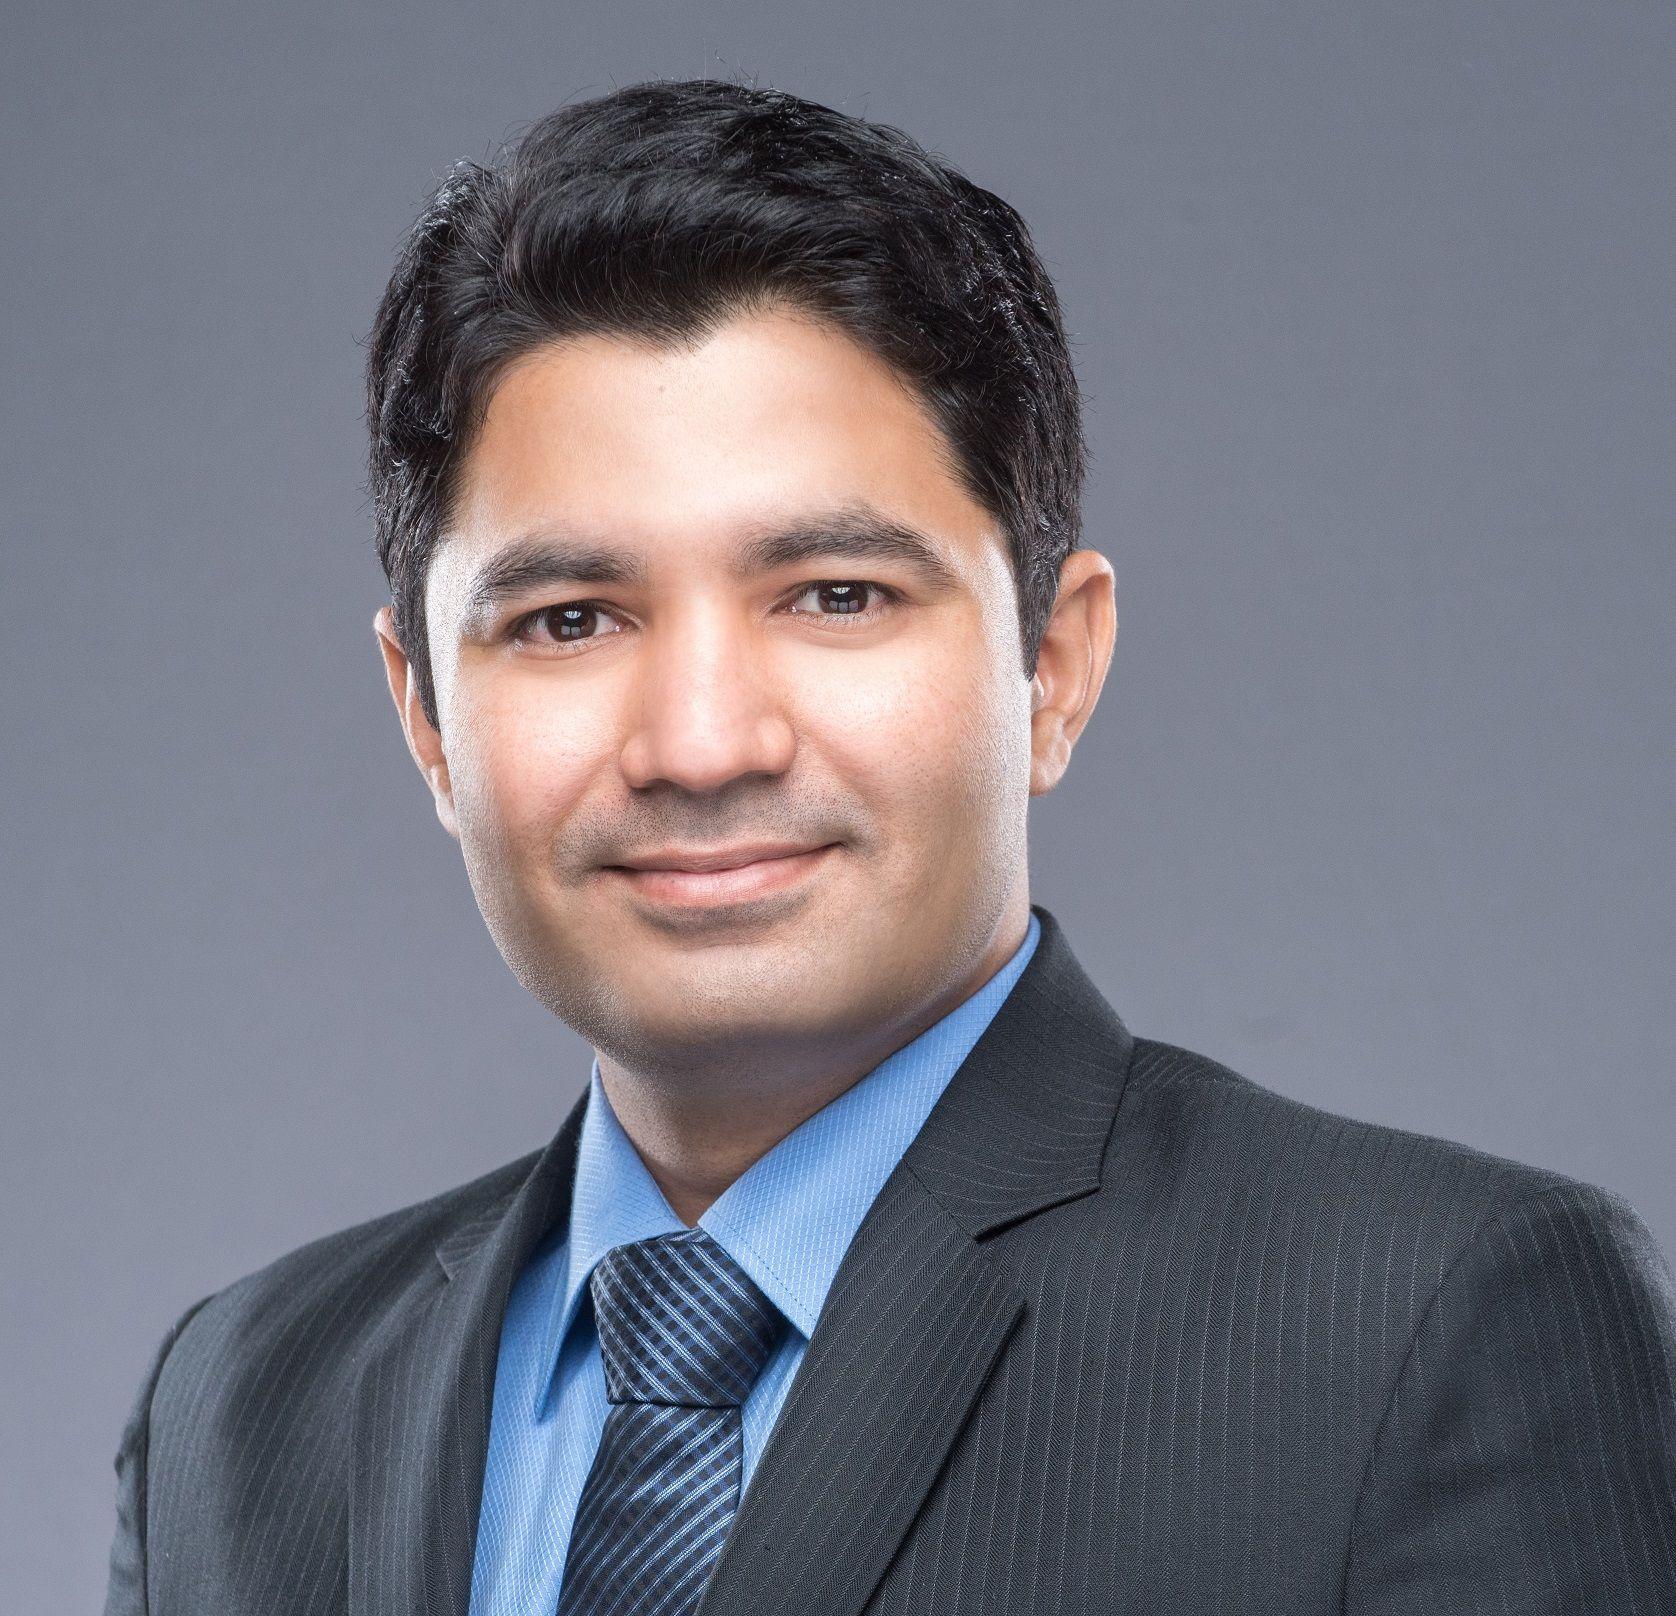 Sandeep Niwas